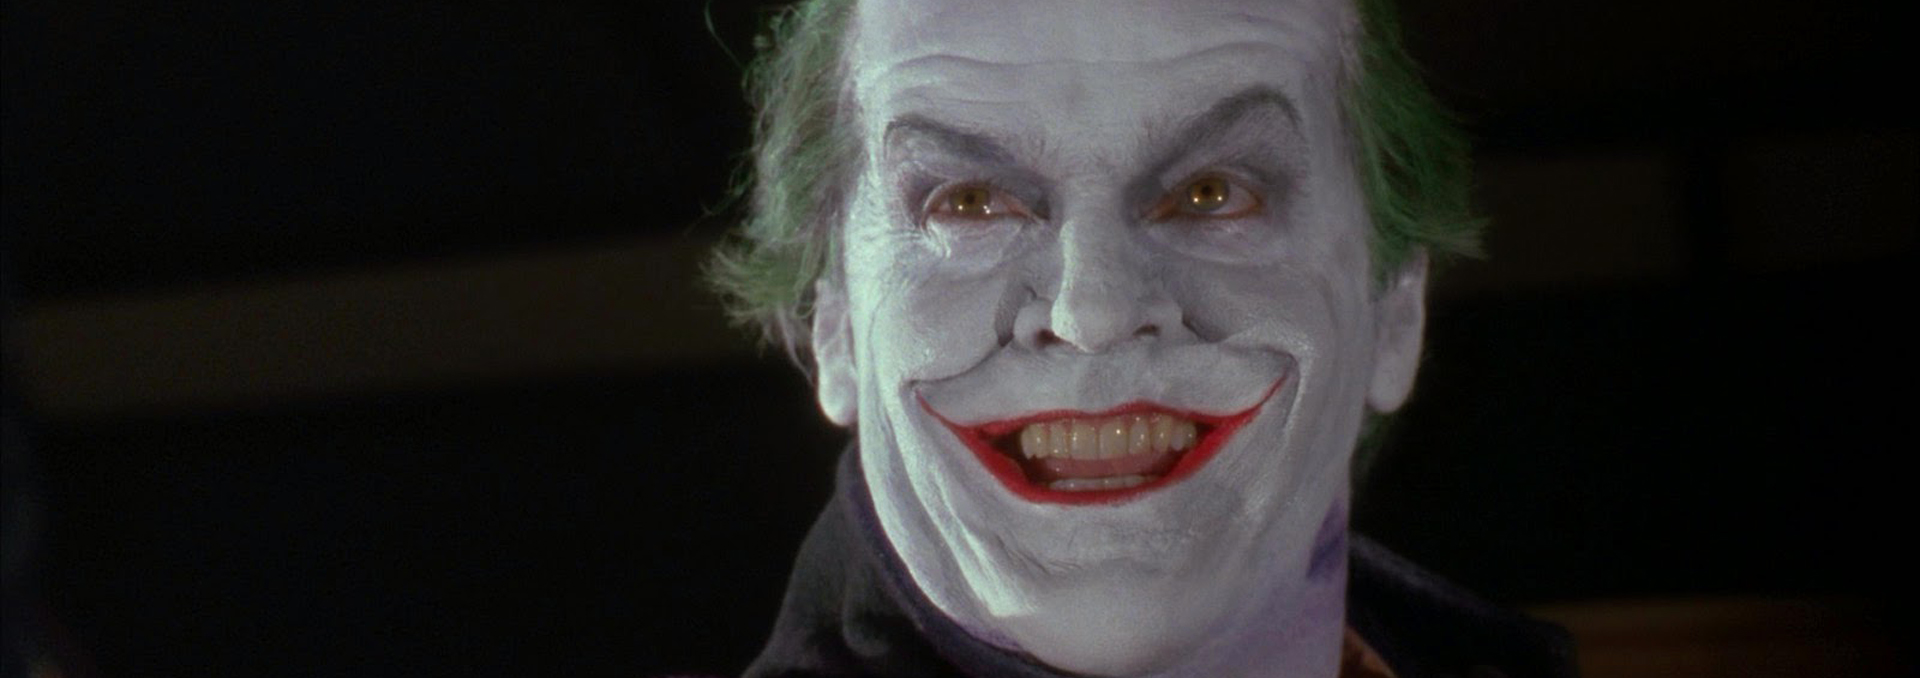 Jack Nicholson as a Joker, parlando di diritto d'autore.